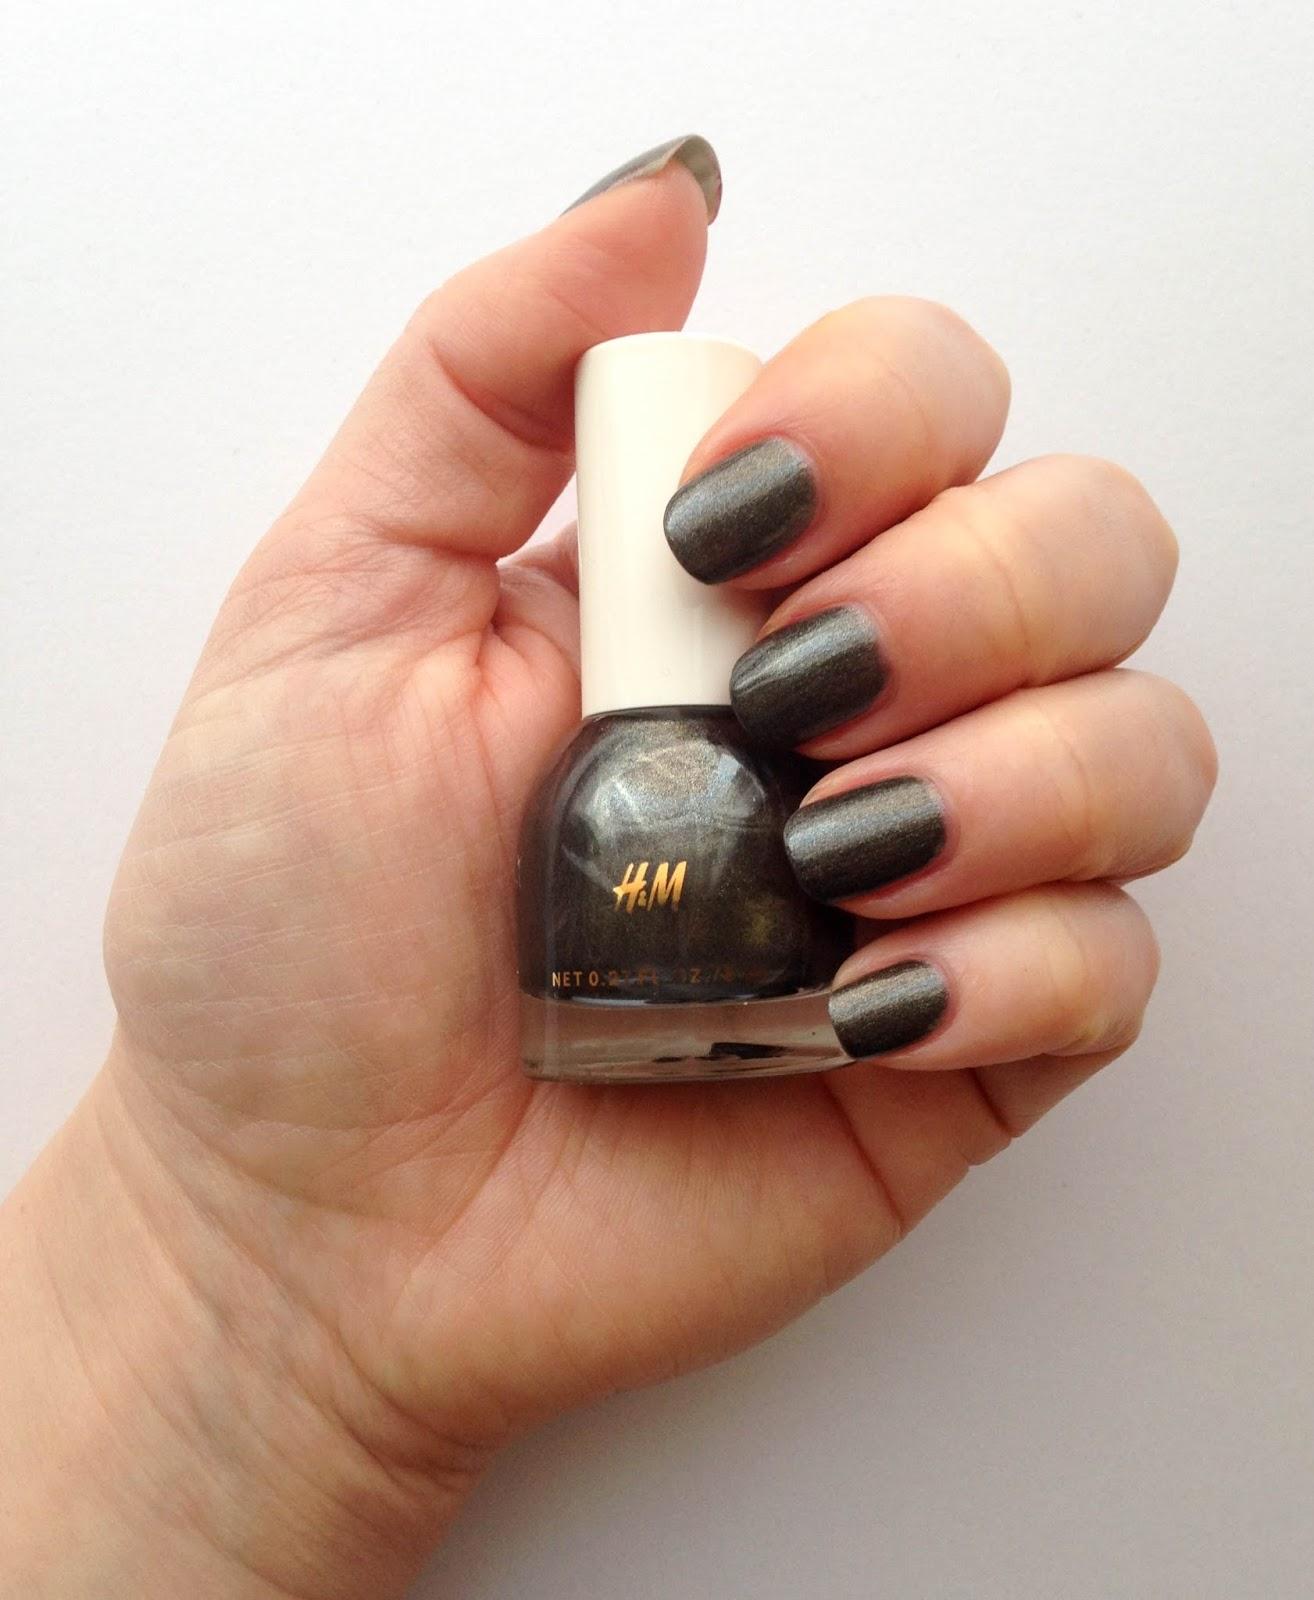 NOTD: H&M nail polish in Mercurial Me | Wrinkles And Heels